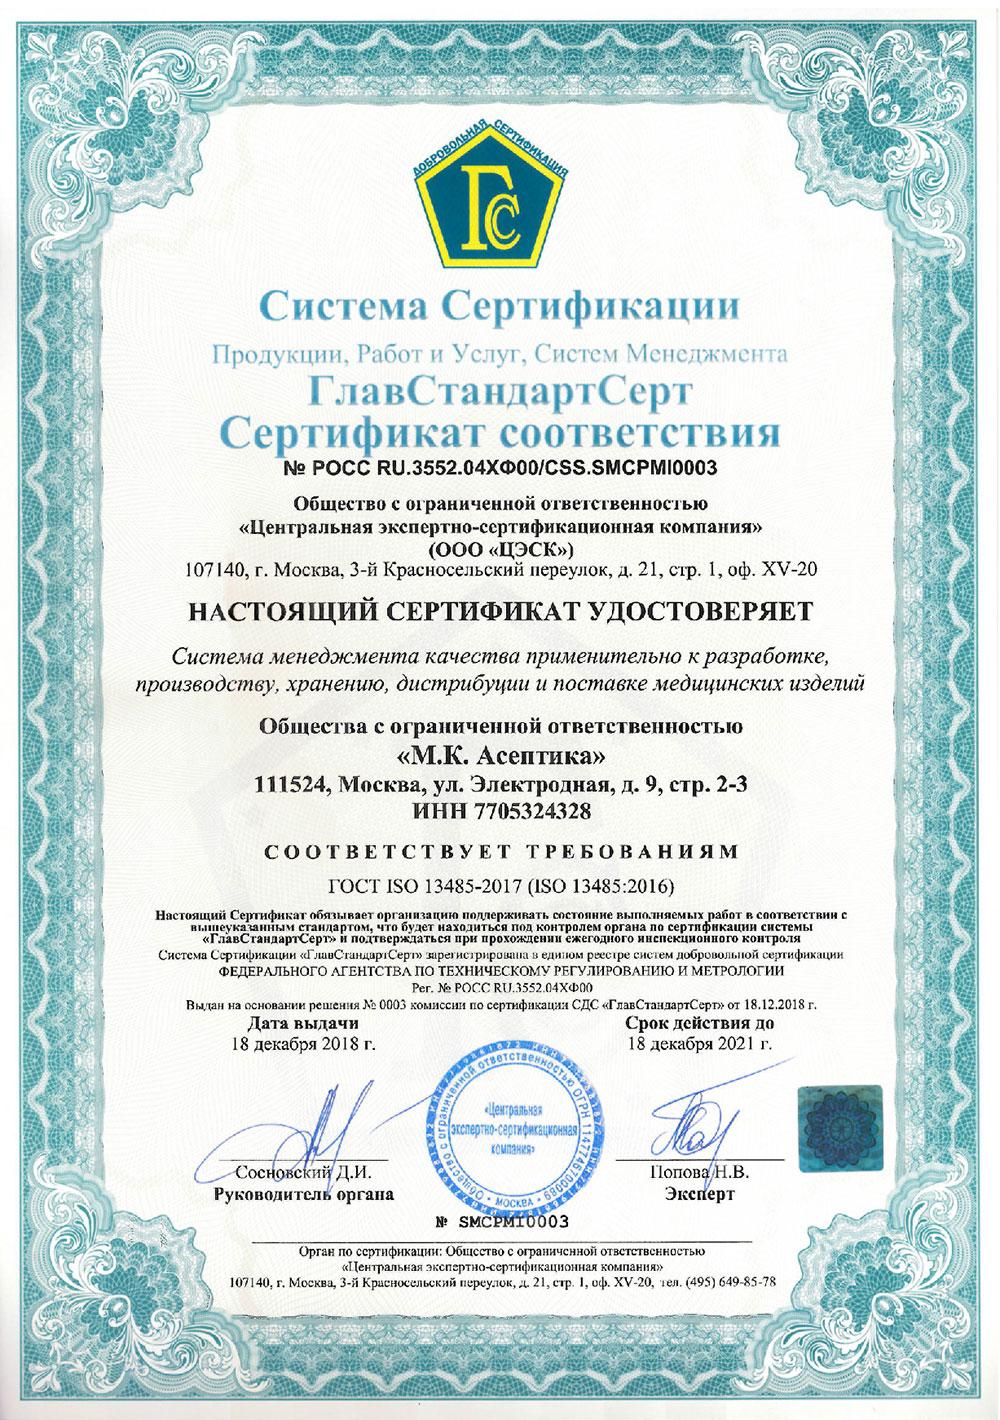 ГлавСтандартСерт — Сертификат соответствия ГОСТ ISO 13458-2017